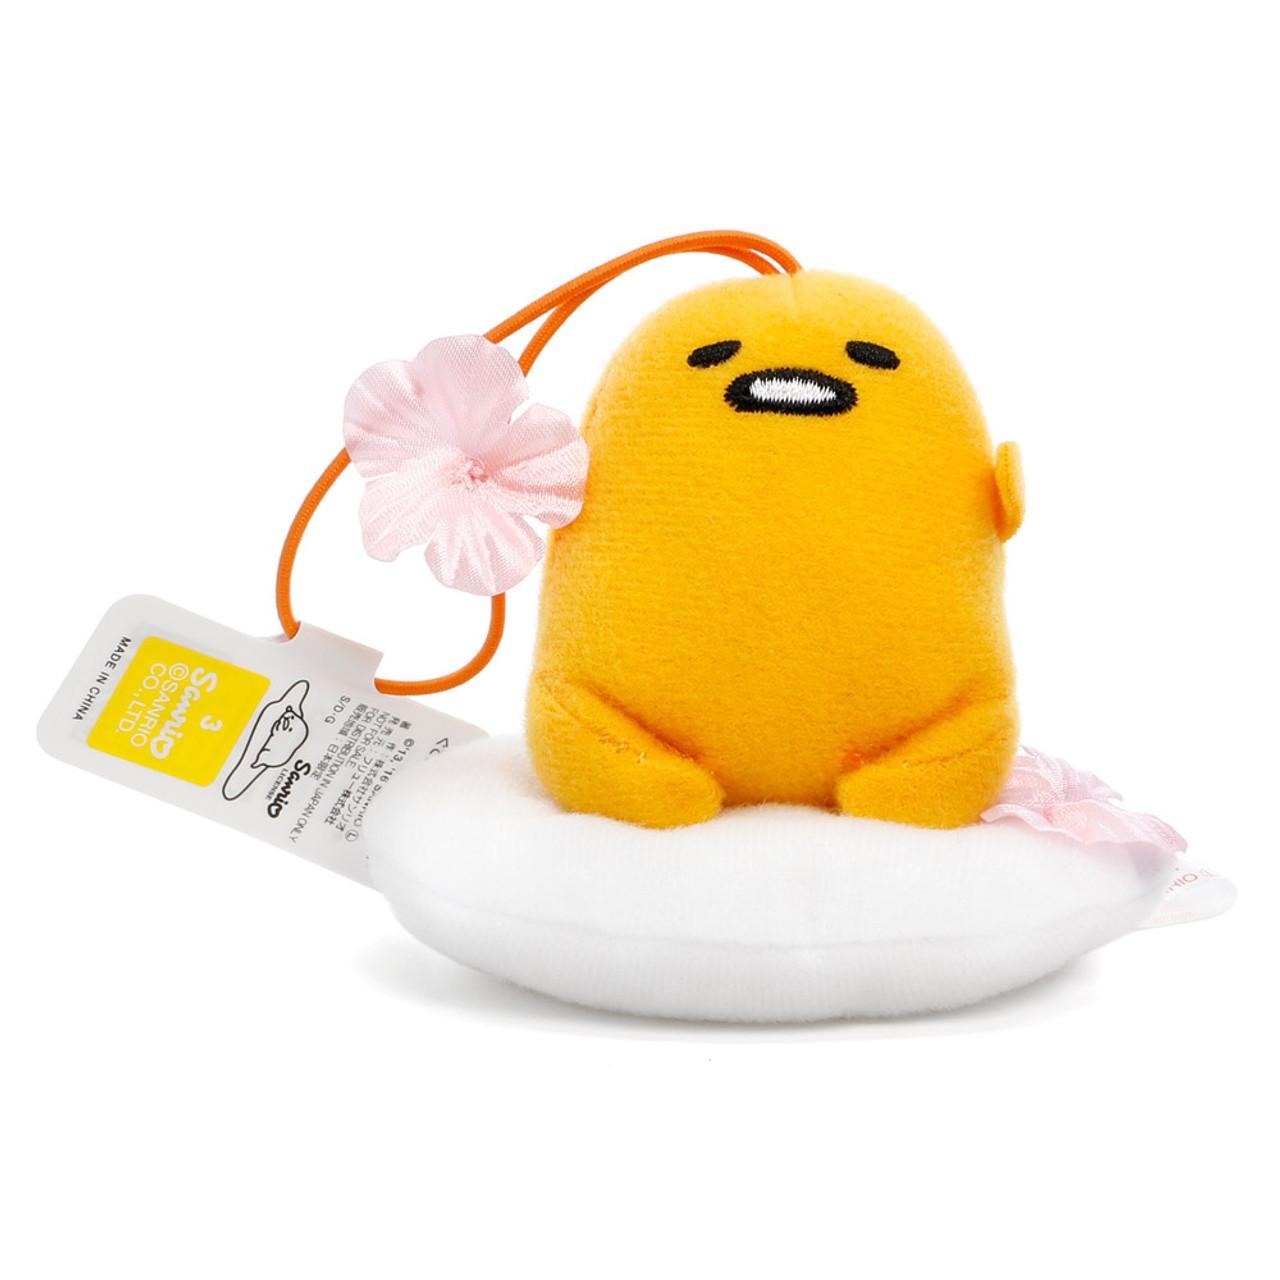 Sanrio Gudetama Lazy Egg Sakura Mascot Plush Charms - Sitting On Sakura Egg White ( Front View )